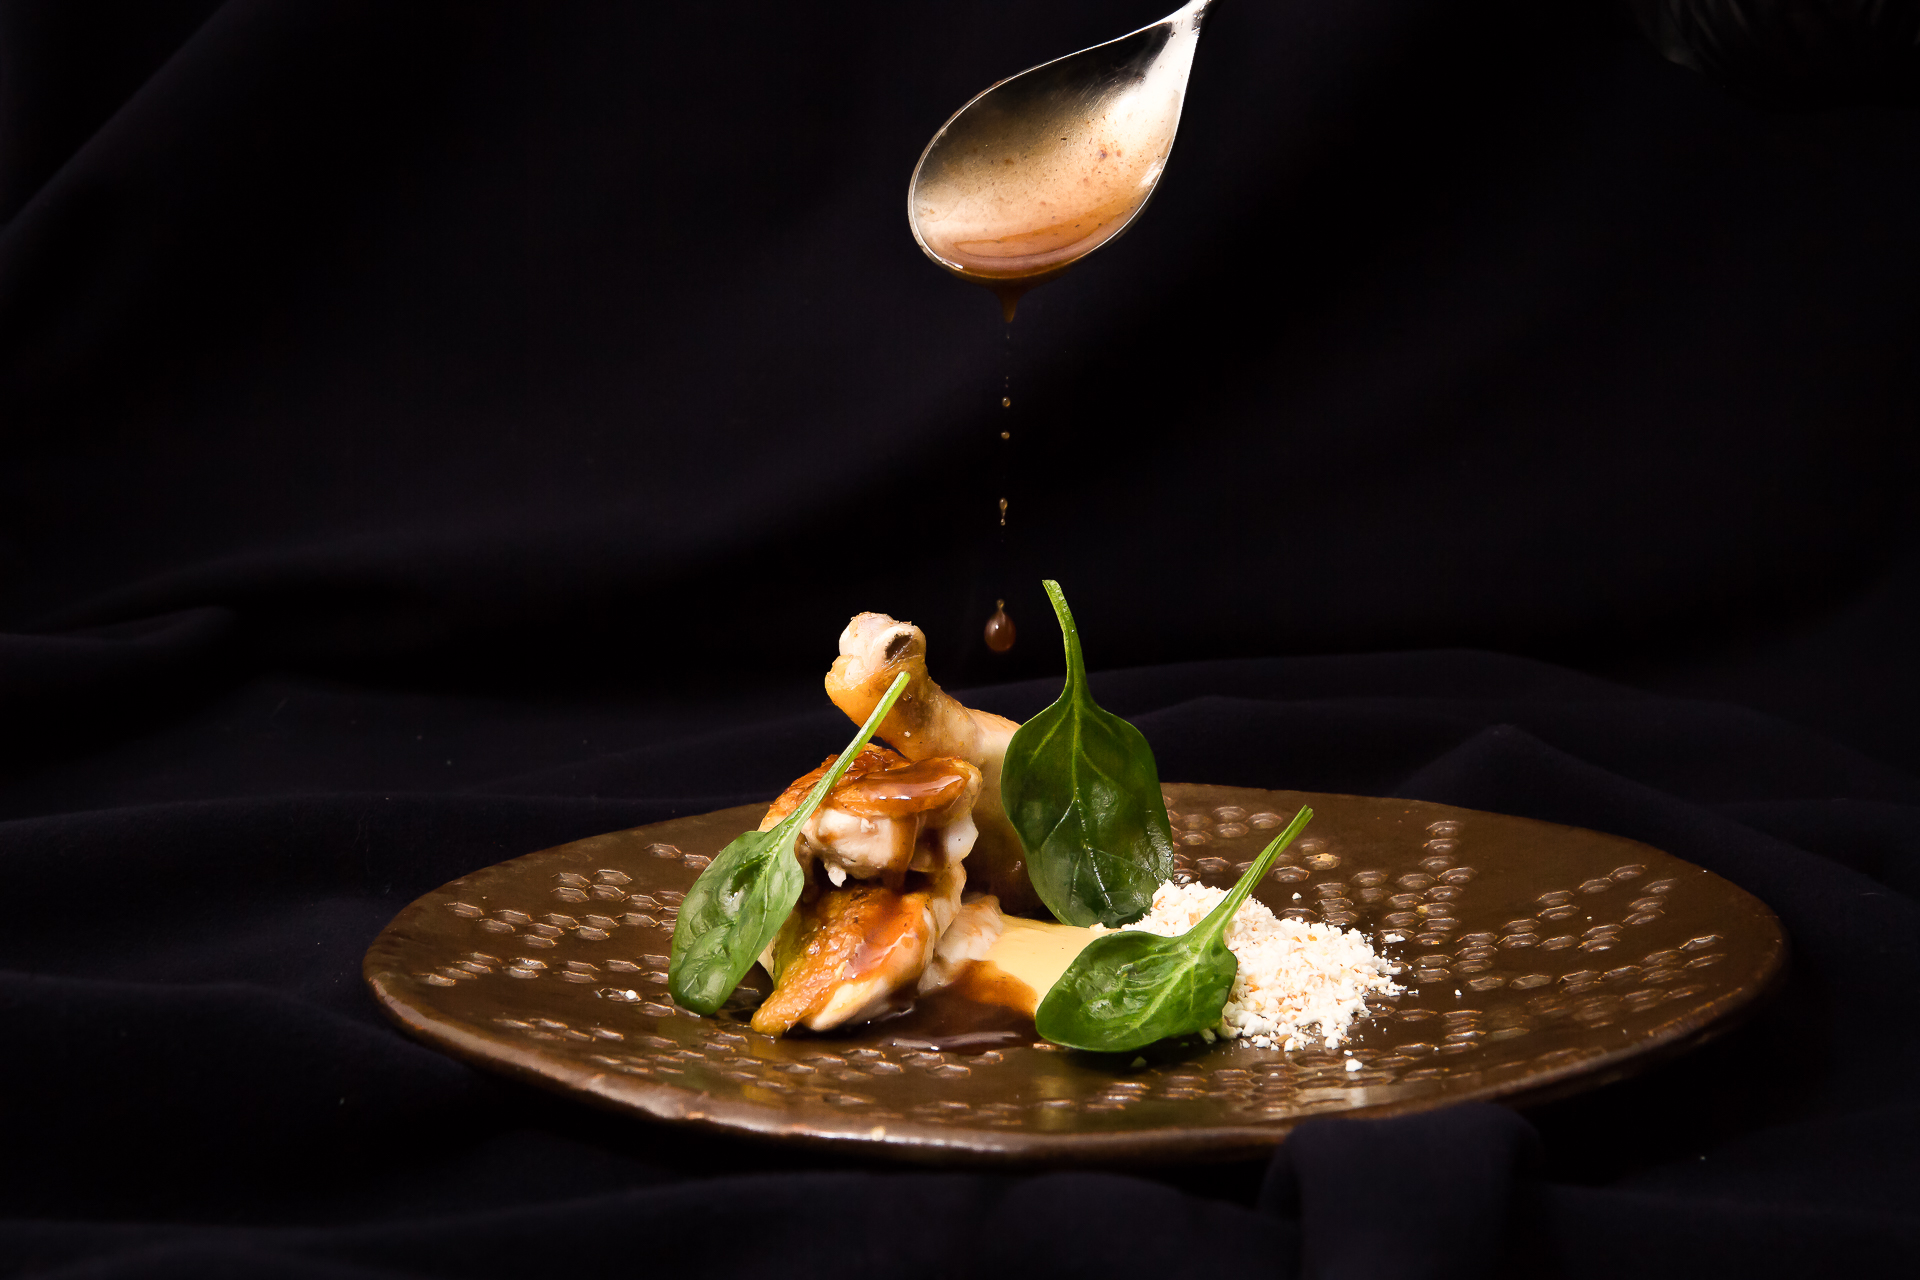 fotografo gastronomico de comida bilbao